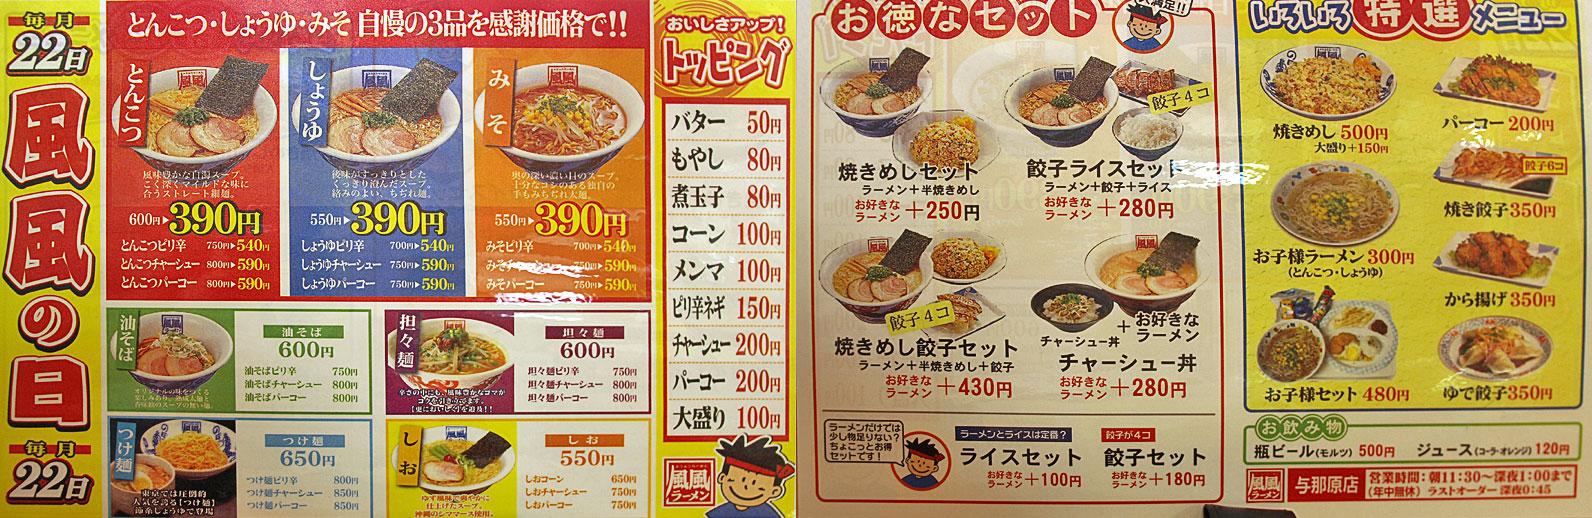 menu_all_yona_fu.jpg